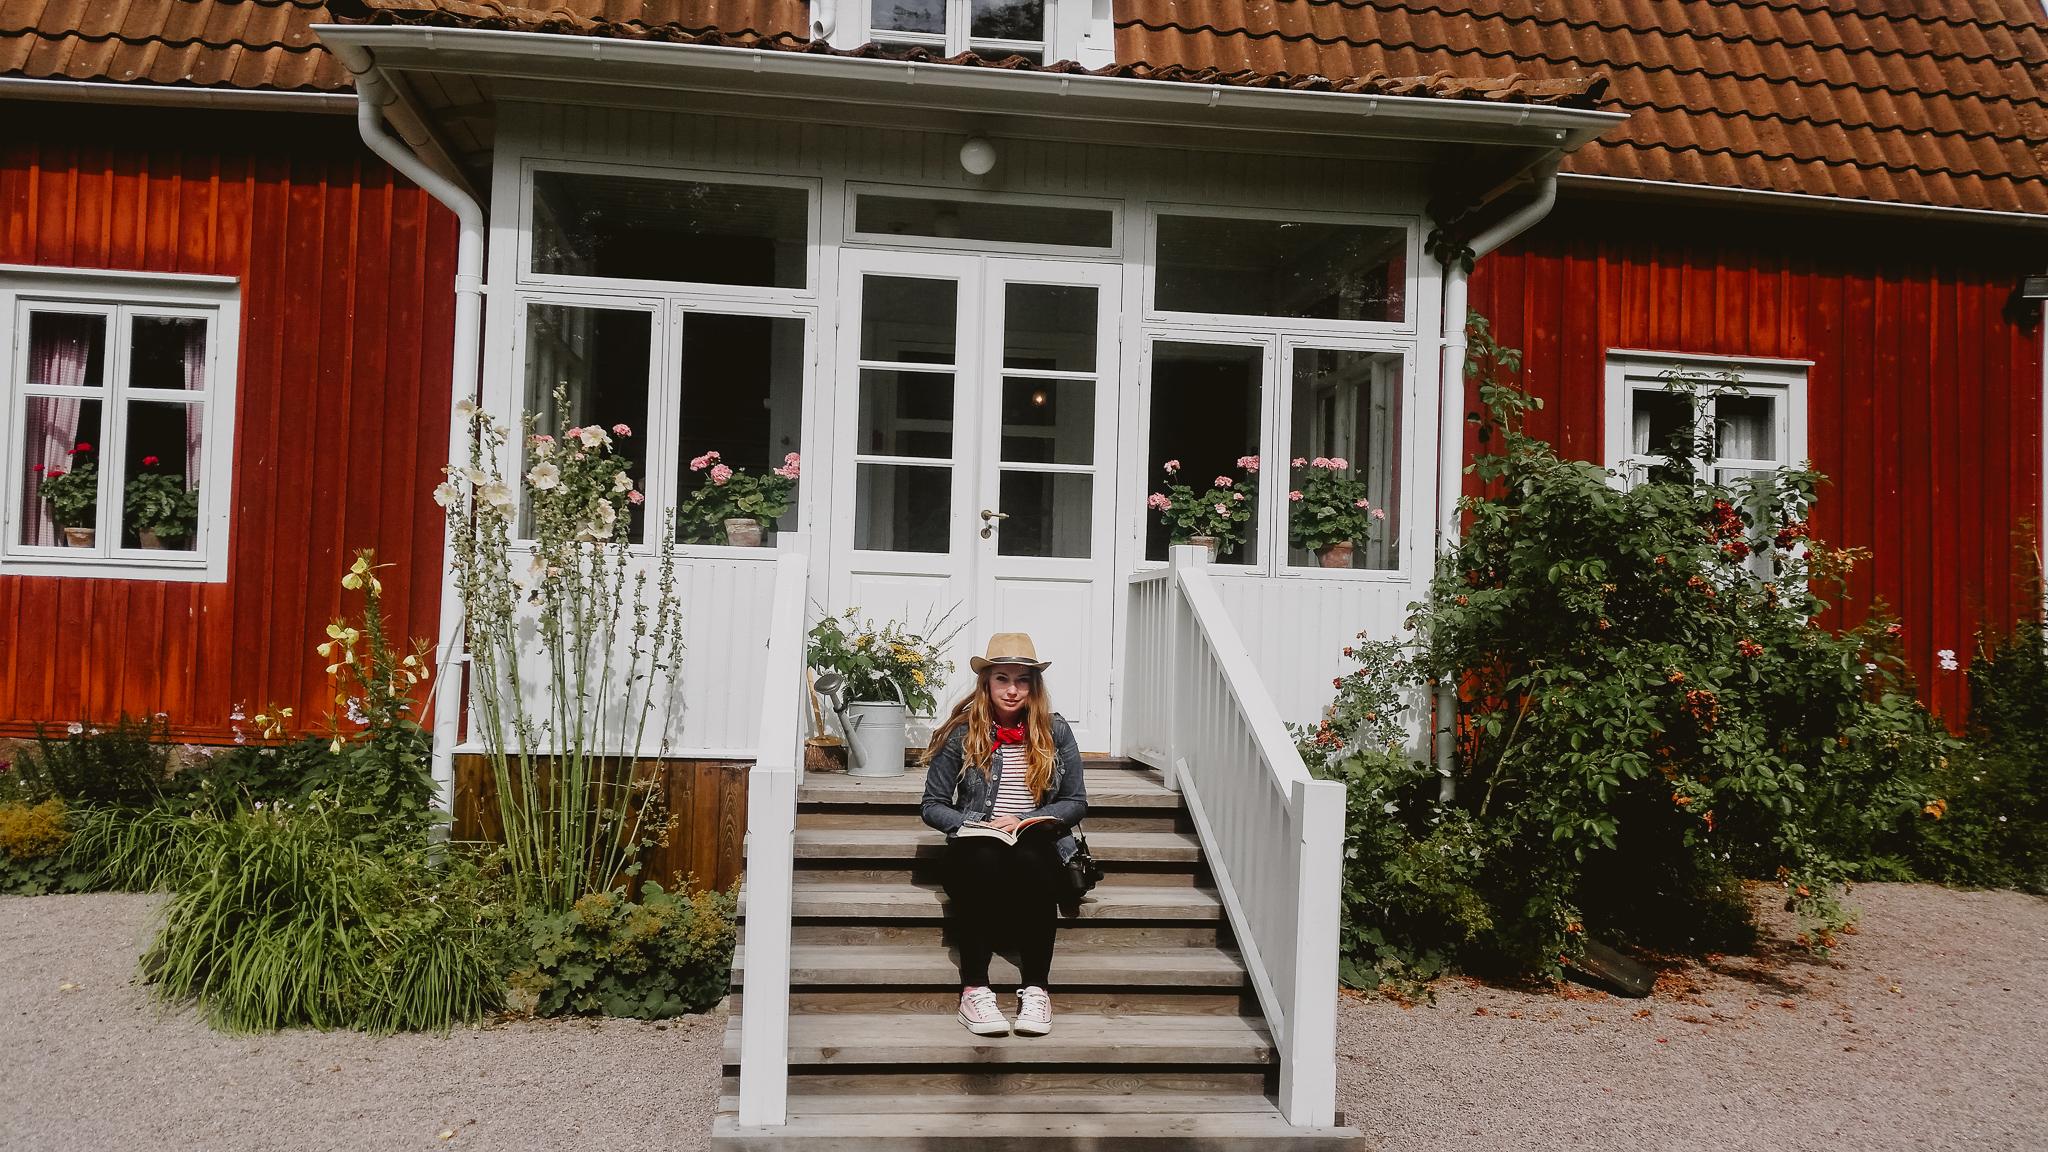 Dom Astrid Lindgren